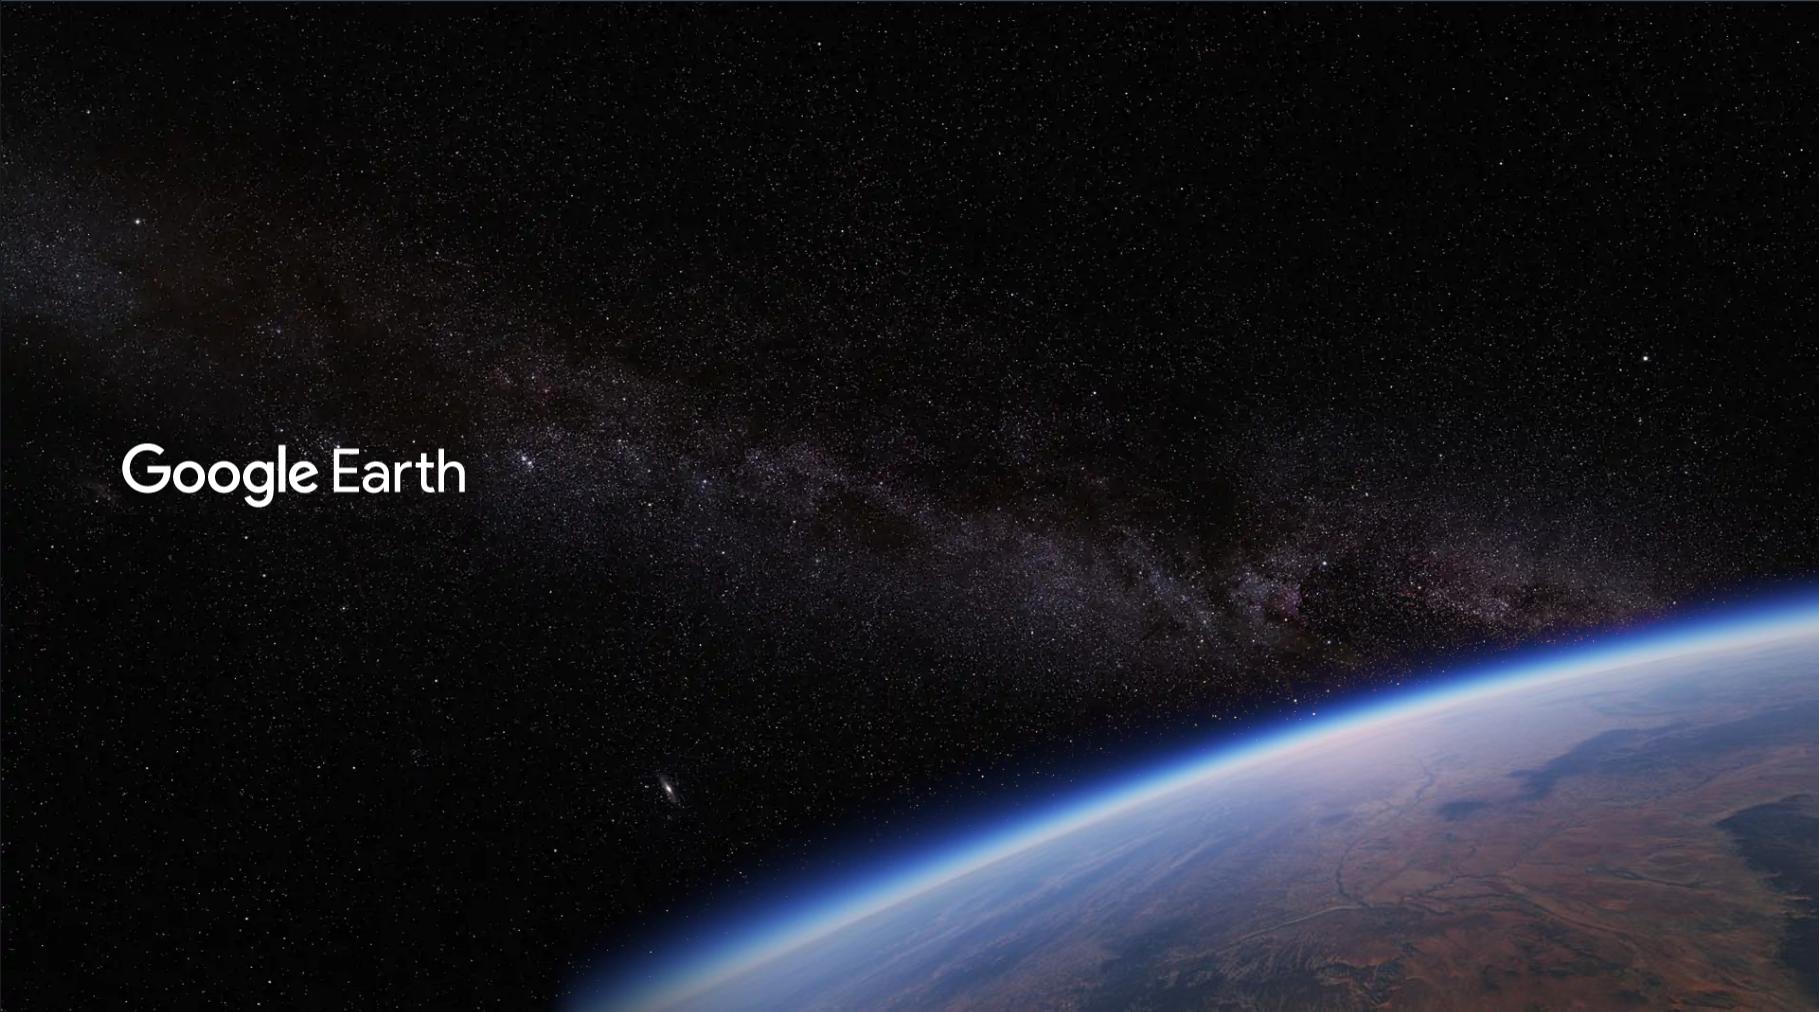 Google Earth (źródło: Google)